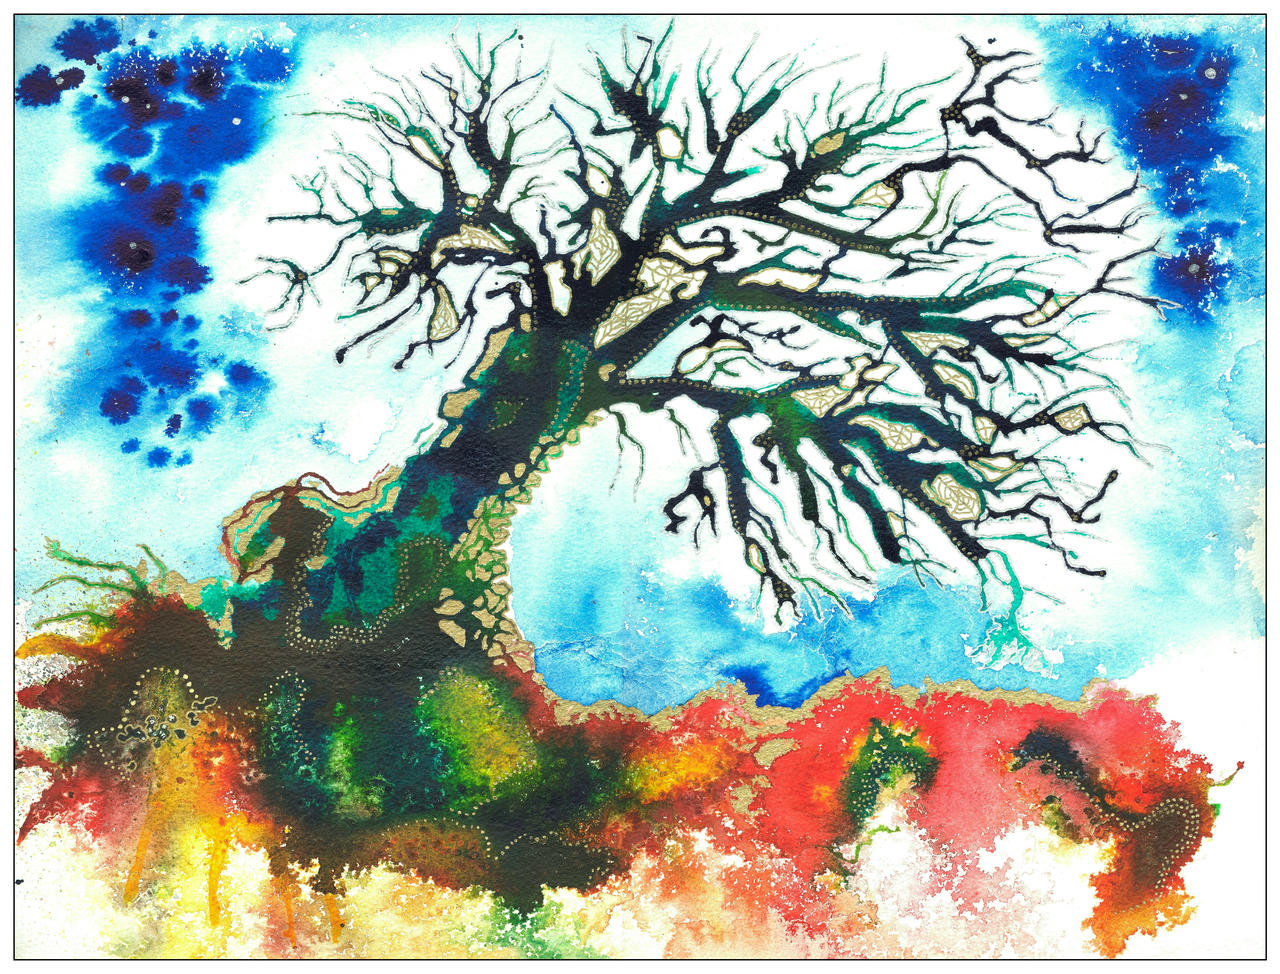 Gossamer Tree by amyhooton